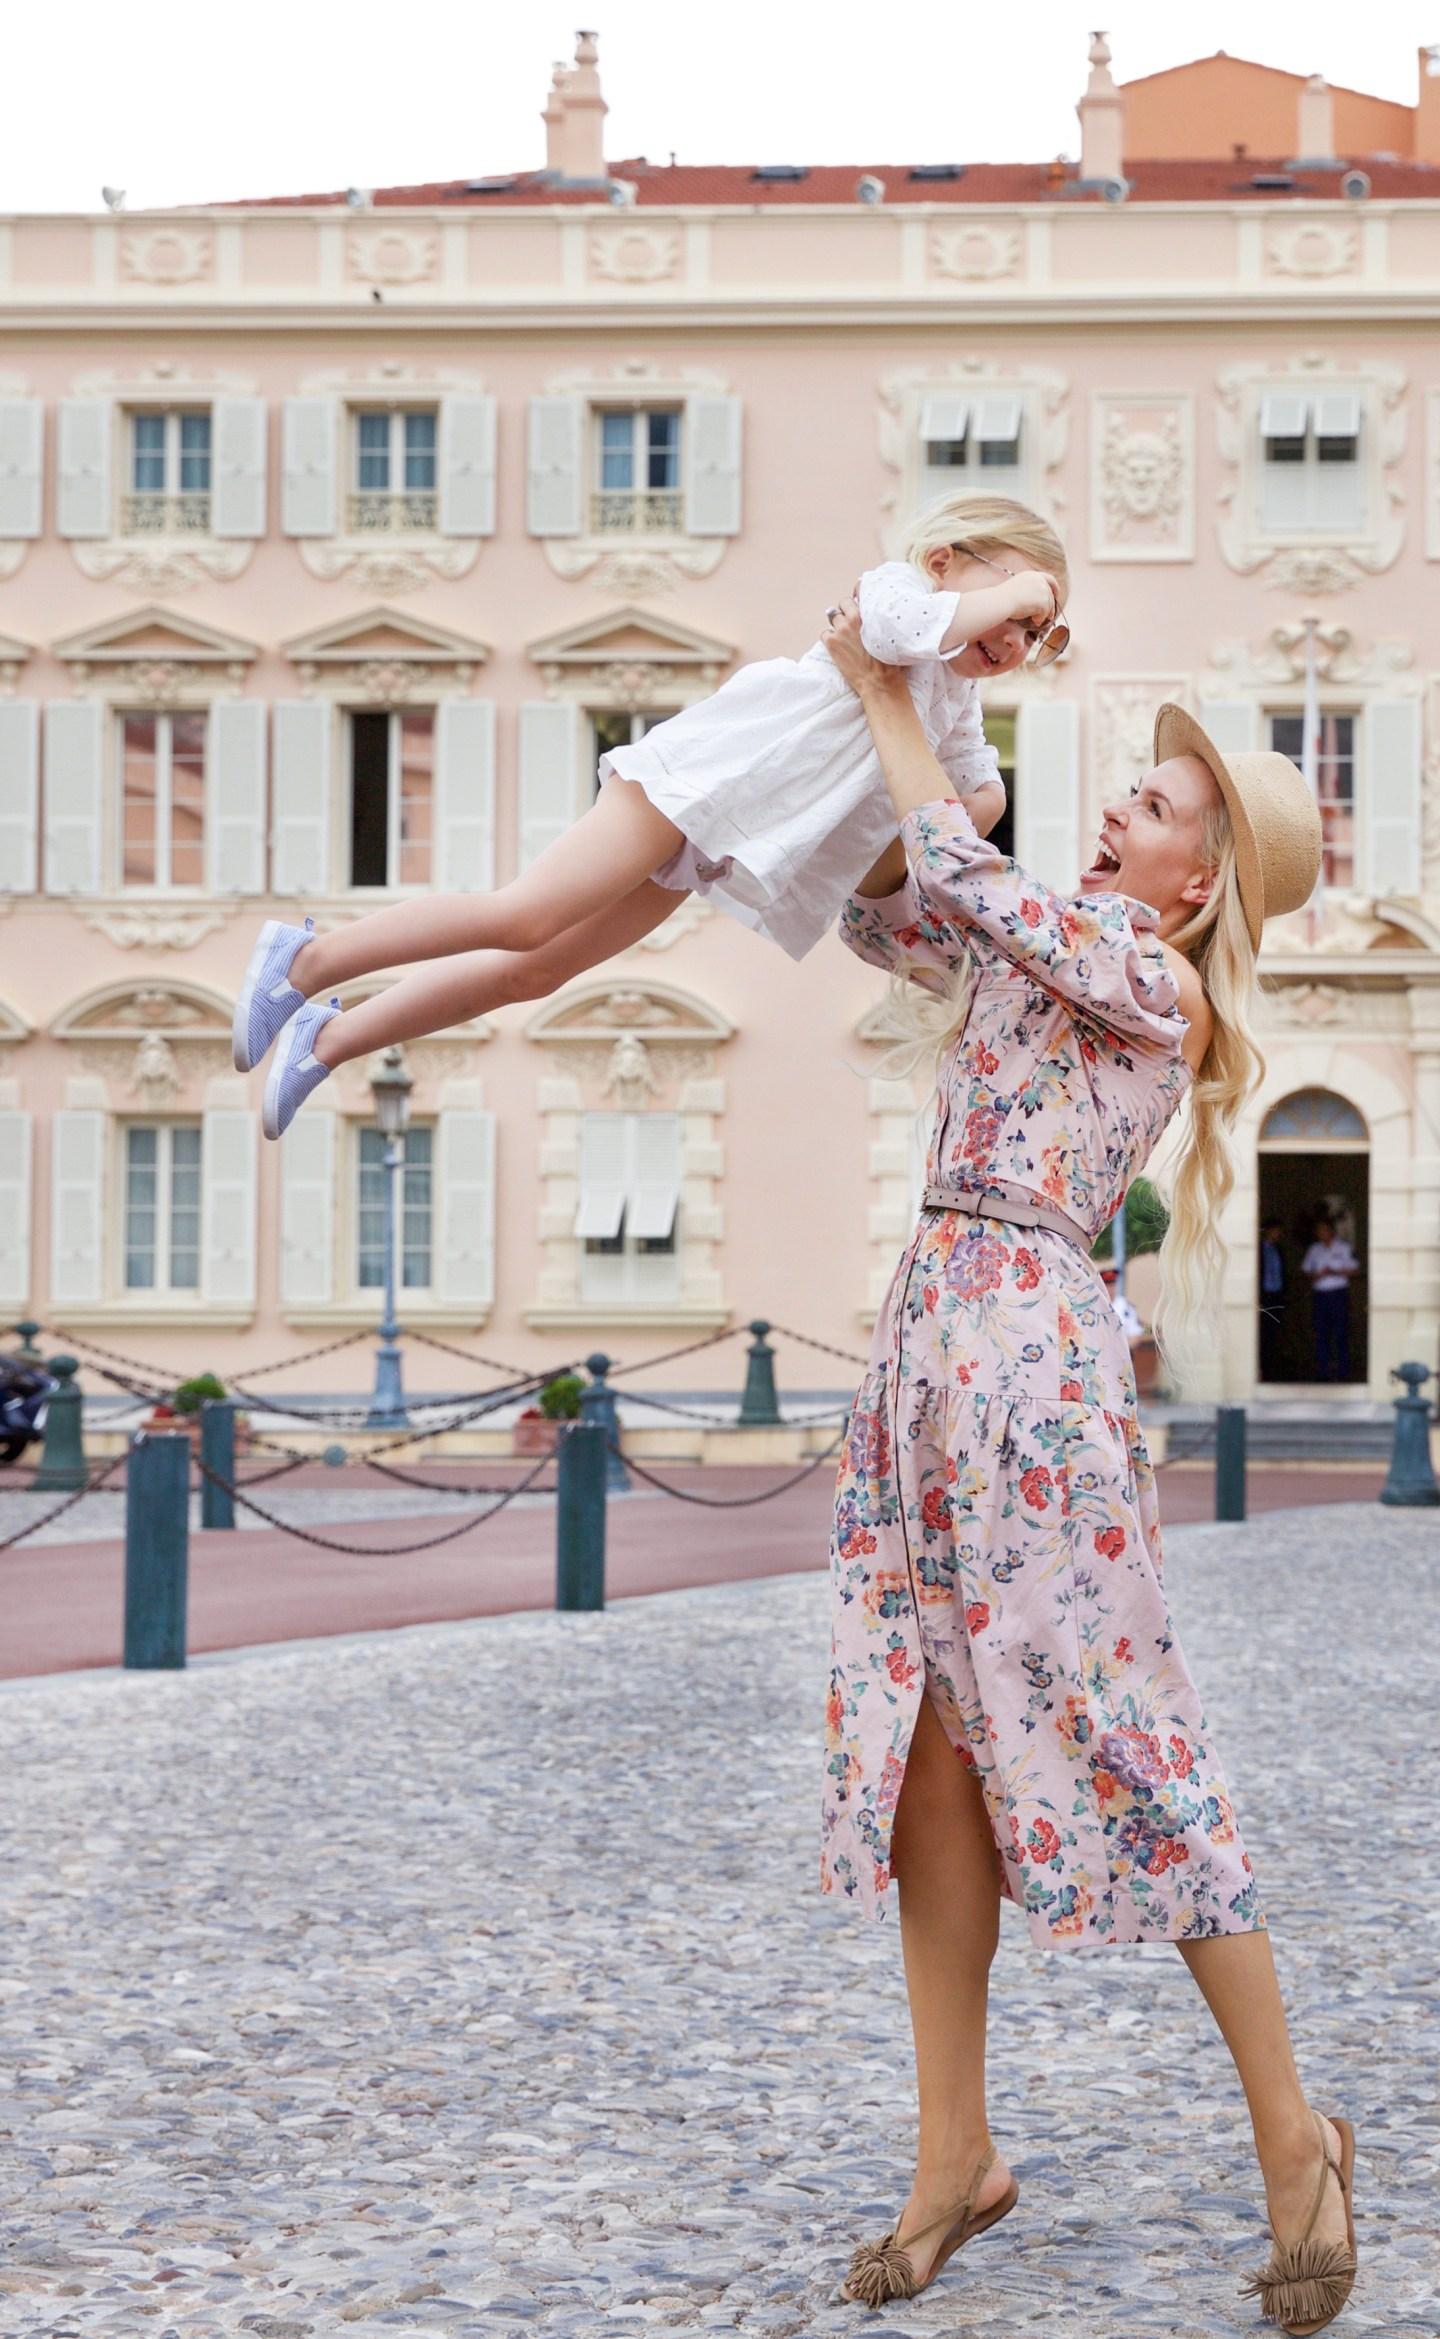 Rebecca Taylor Marlena Off the Shoulder Floral Midi Dress exploring Monaco this summer